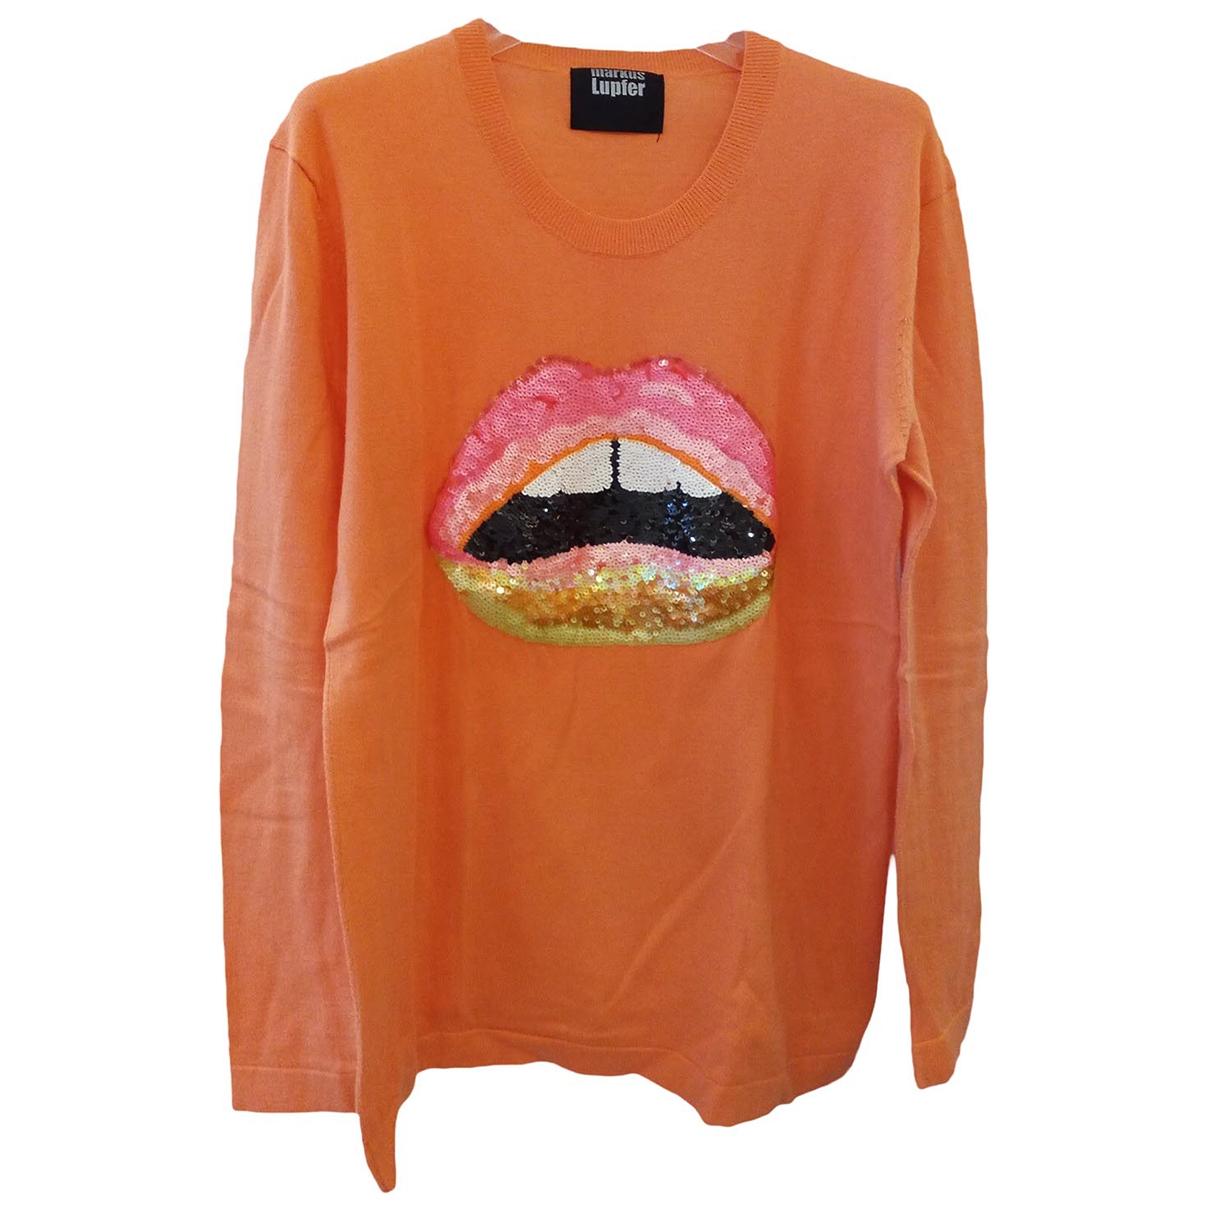 Markus Lupfer \N Orange Cotton Knitwear for Women S International